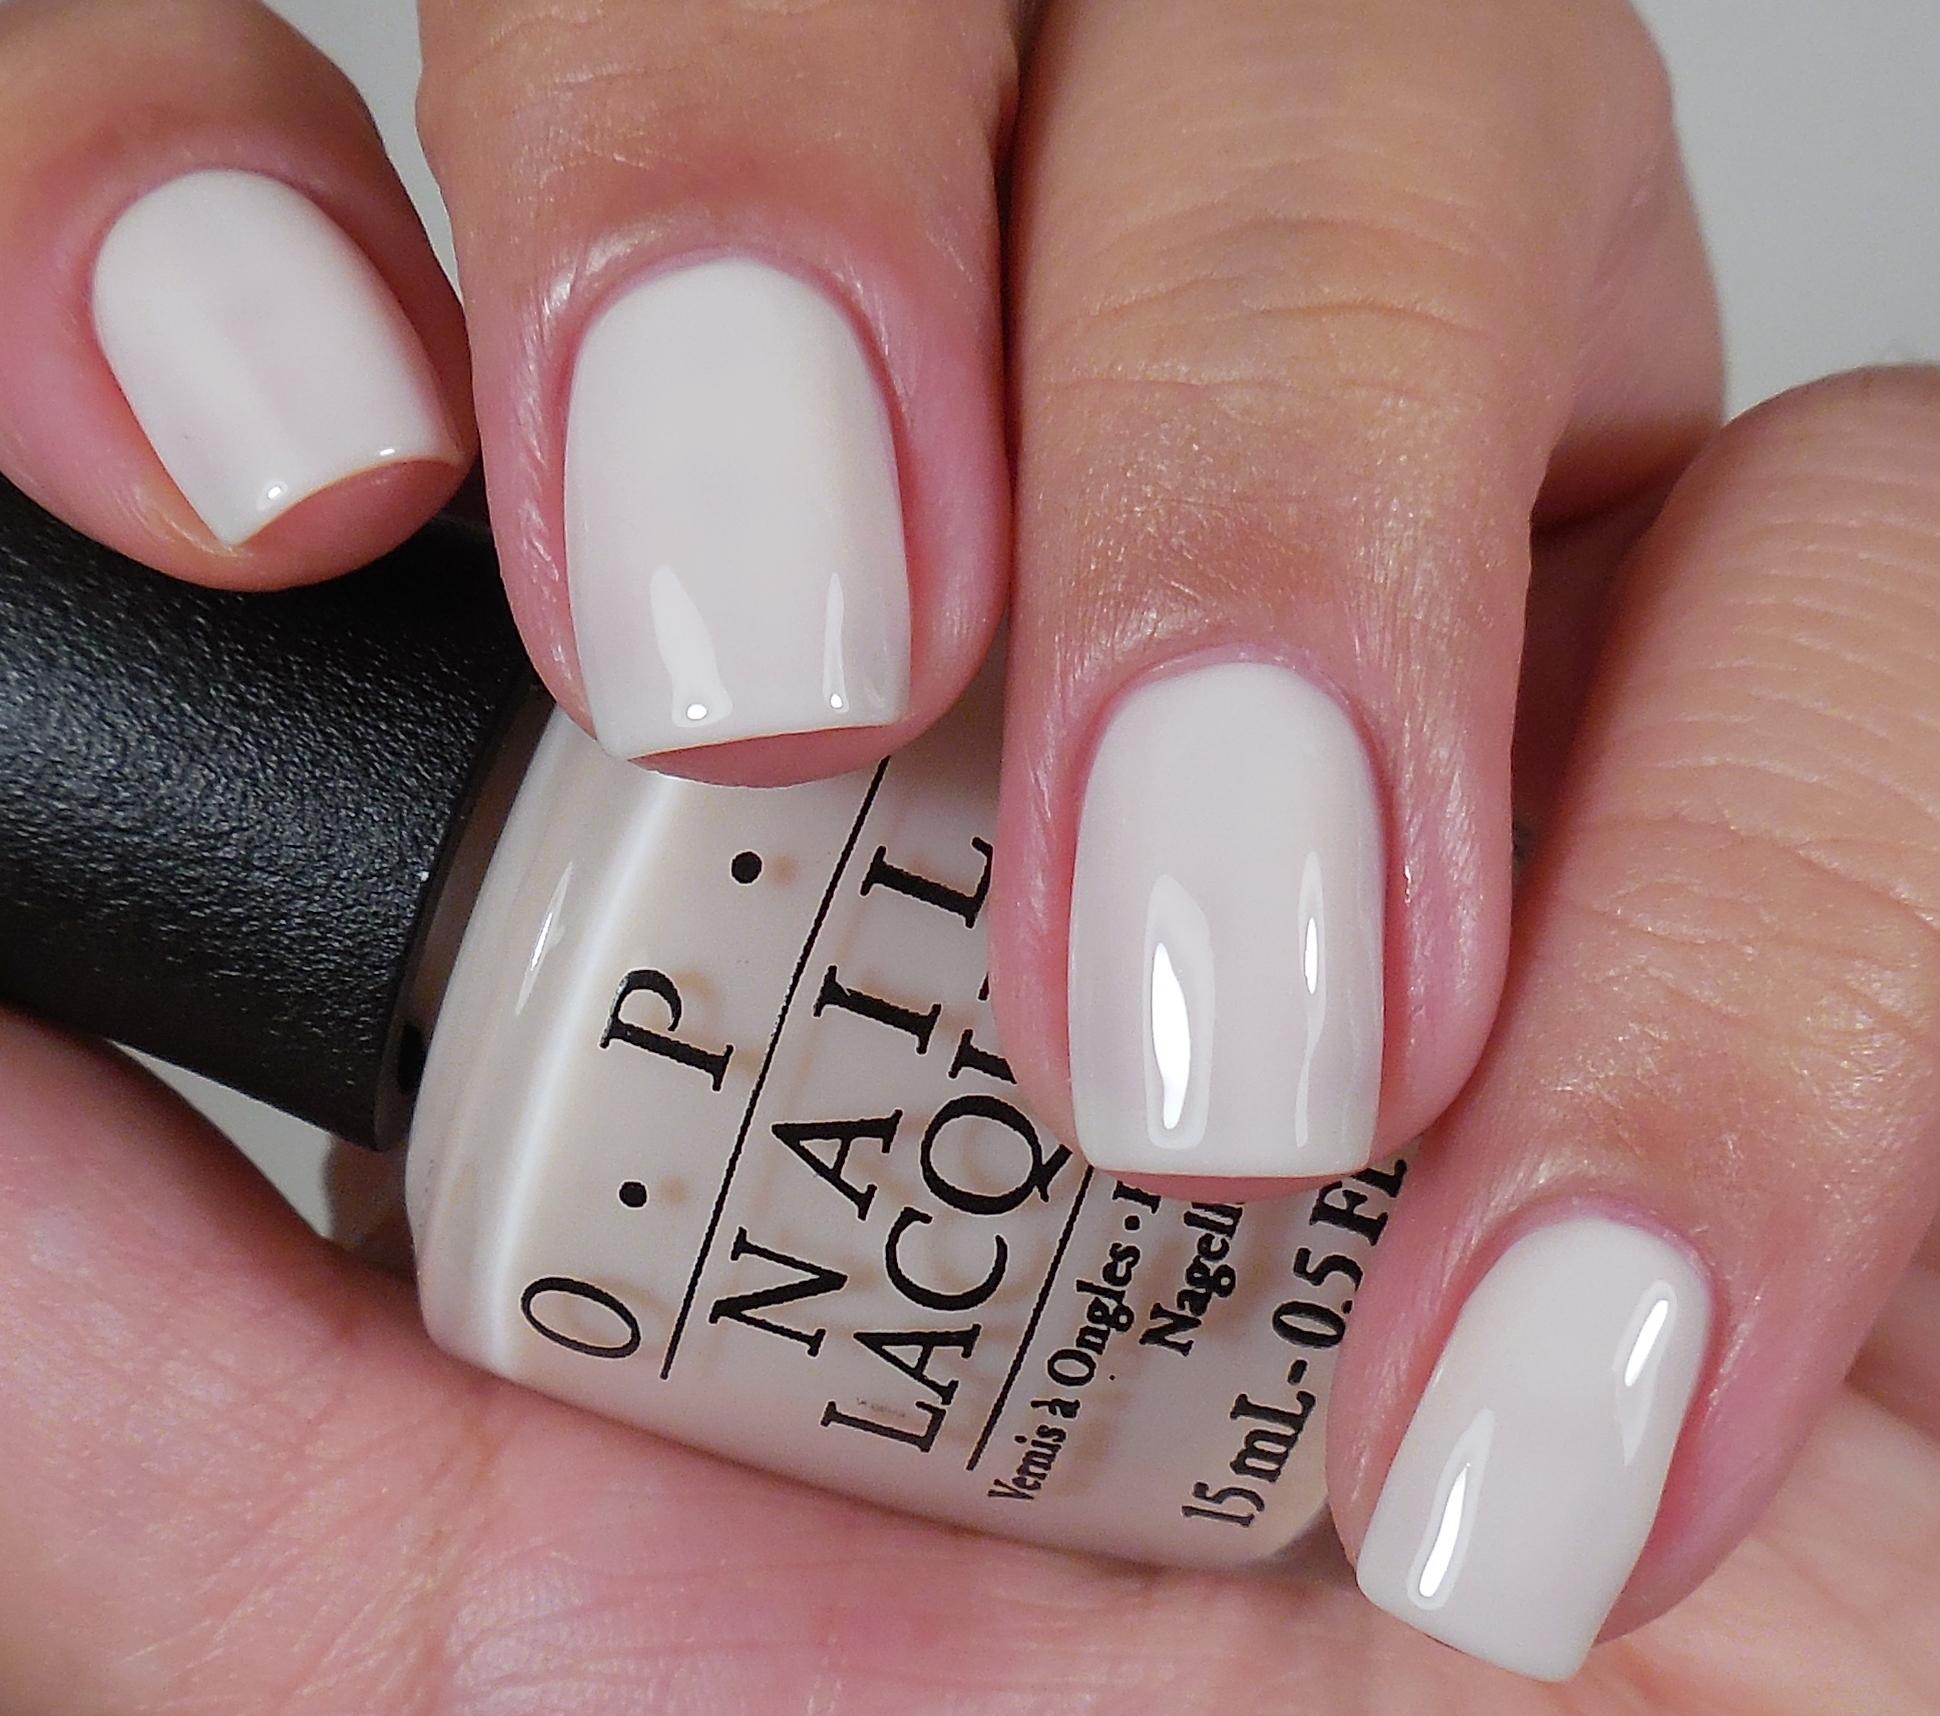 Miss BB Reviews: OPI Soft Shades Collection 2015 - Bridal Beauty ...